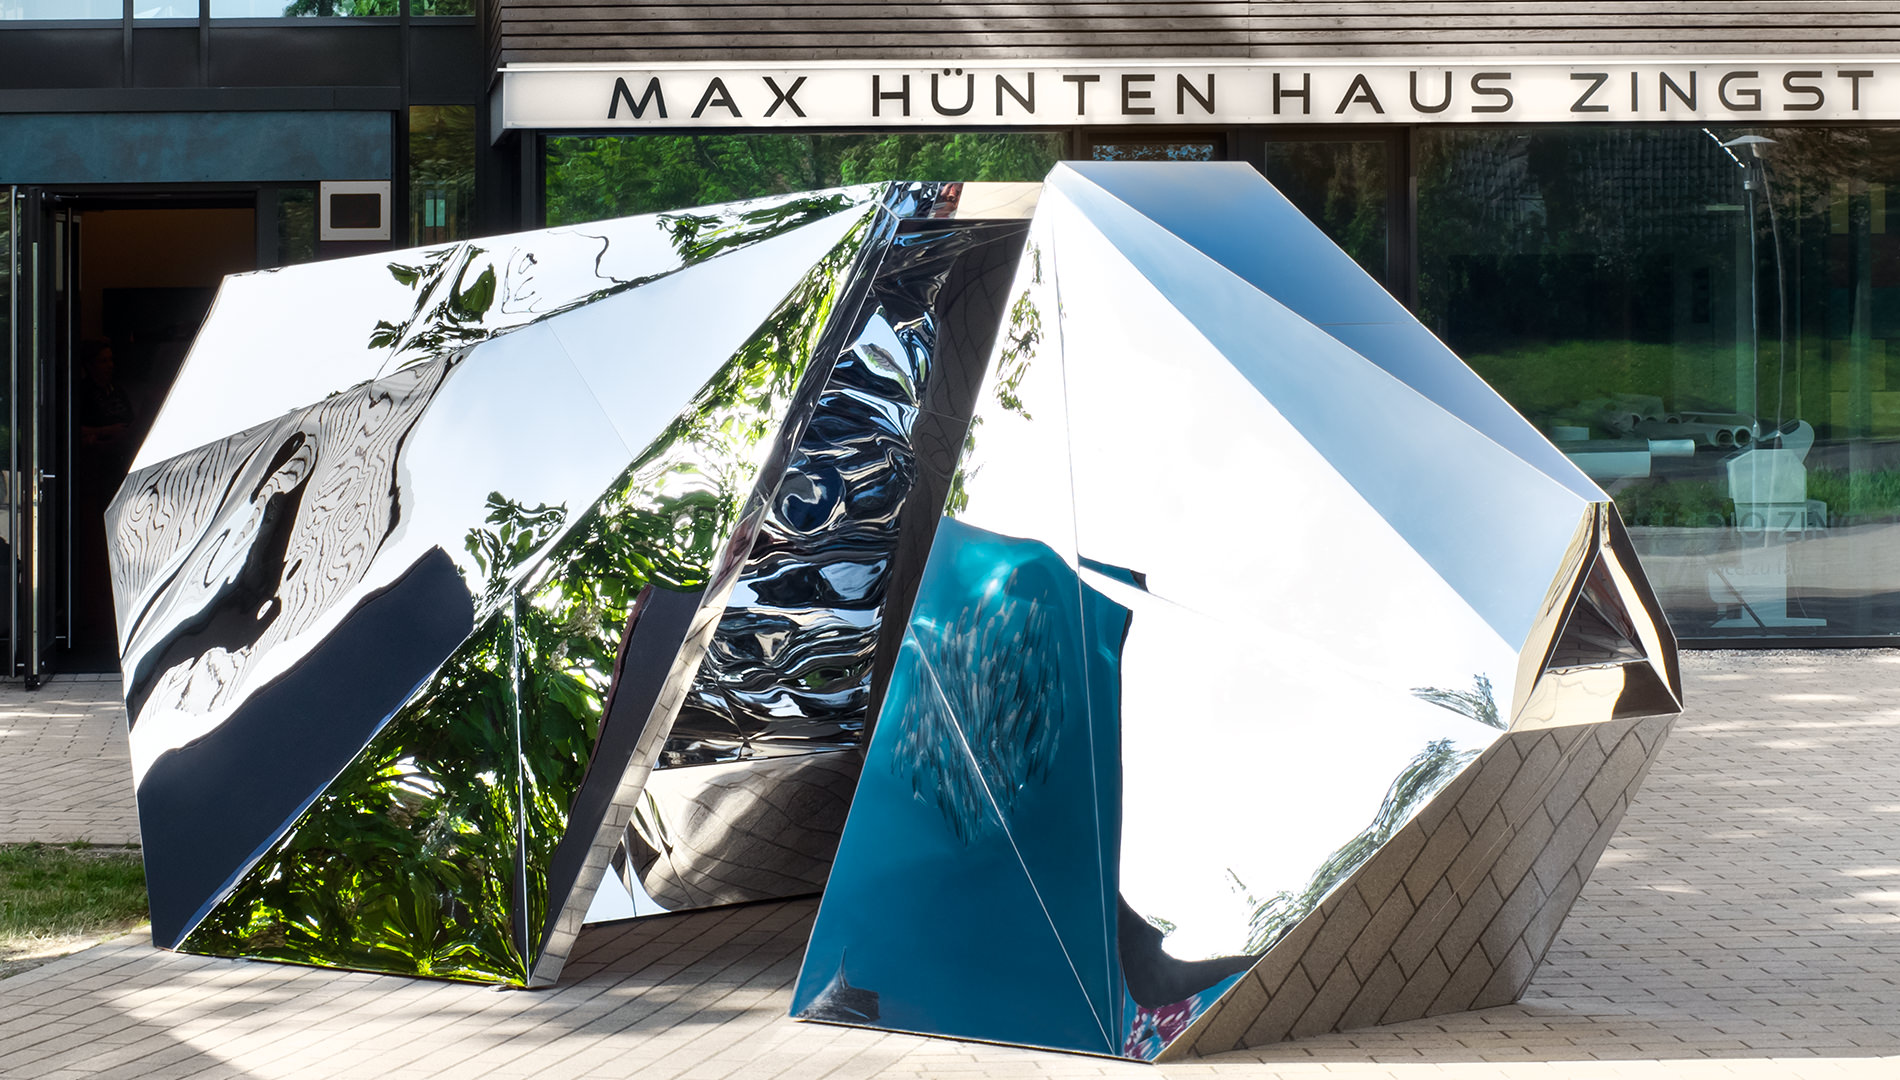 Messe Design Live Kommunikation Zingst Fotokunstpfad Spiegel Max Hünten Haus Going Places EventLabs